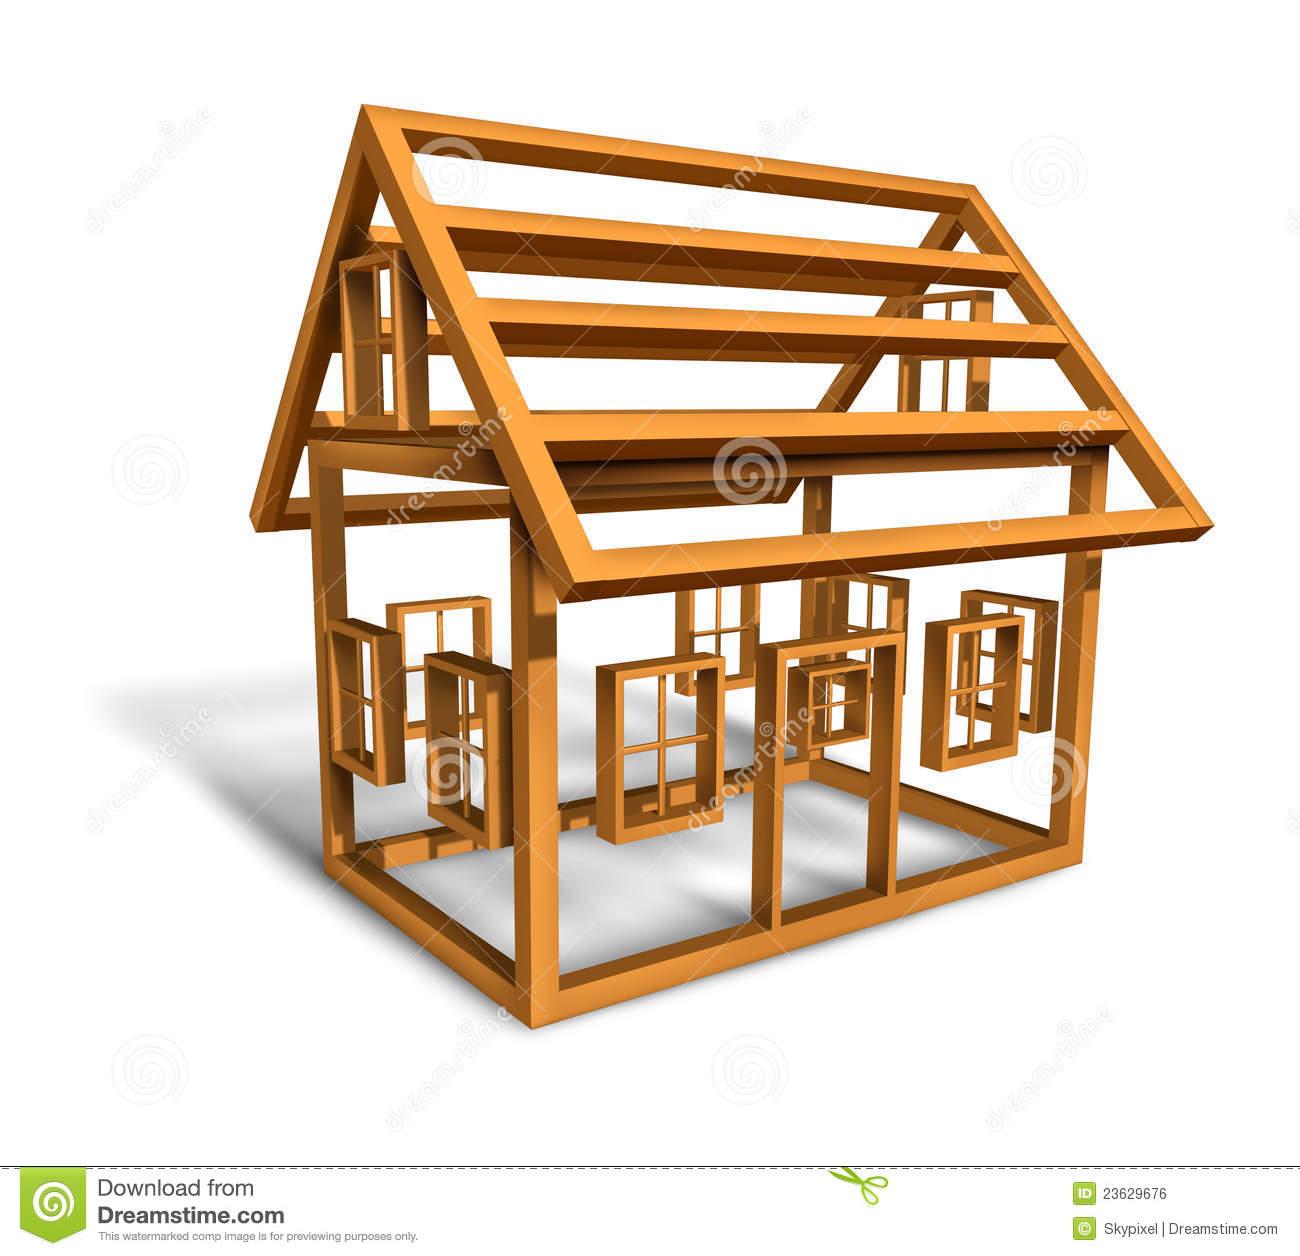 House Construction Clipart.